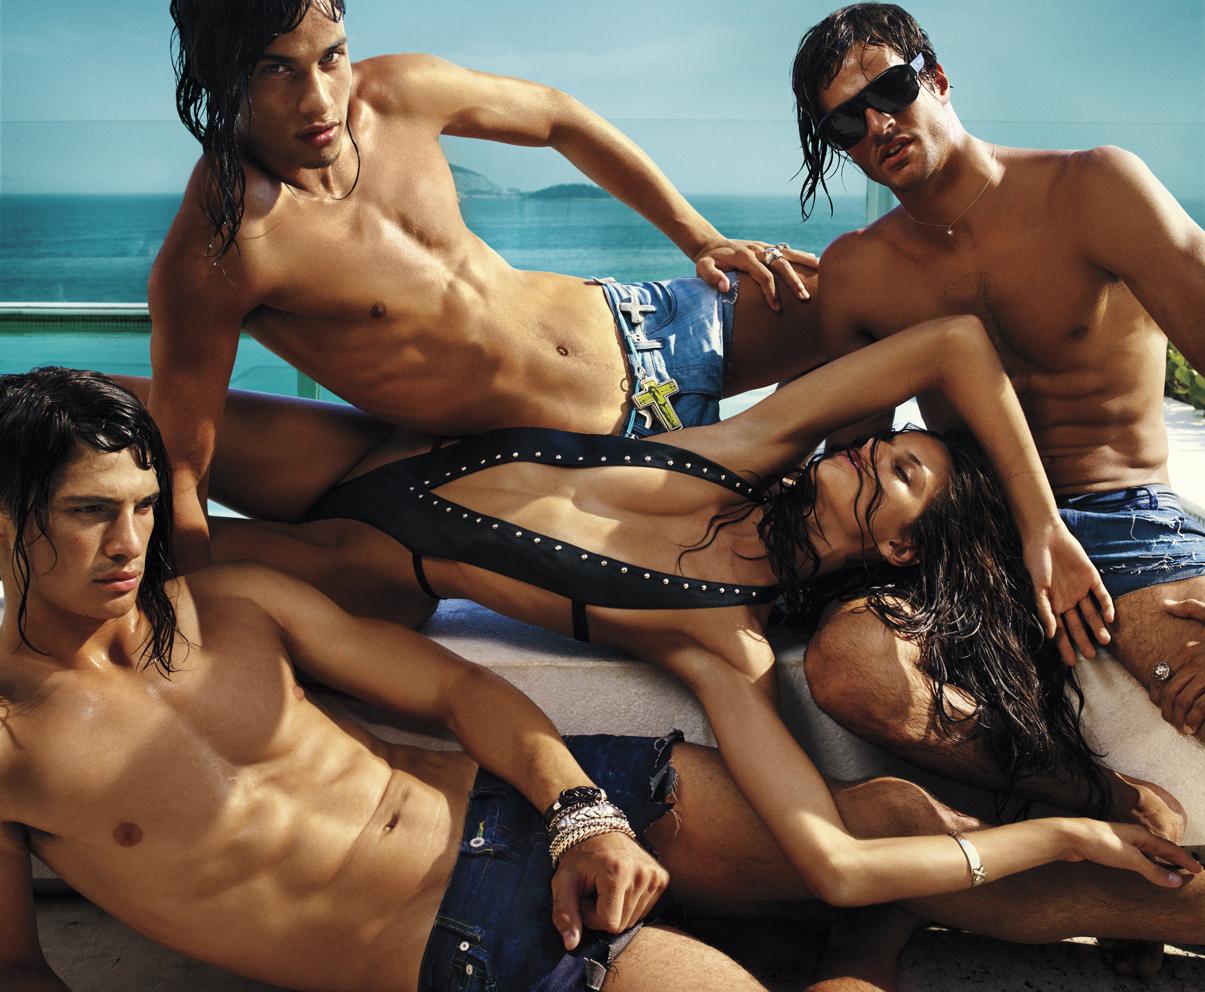 фото голых девушек среди мужчин